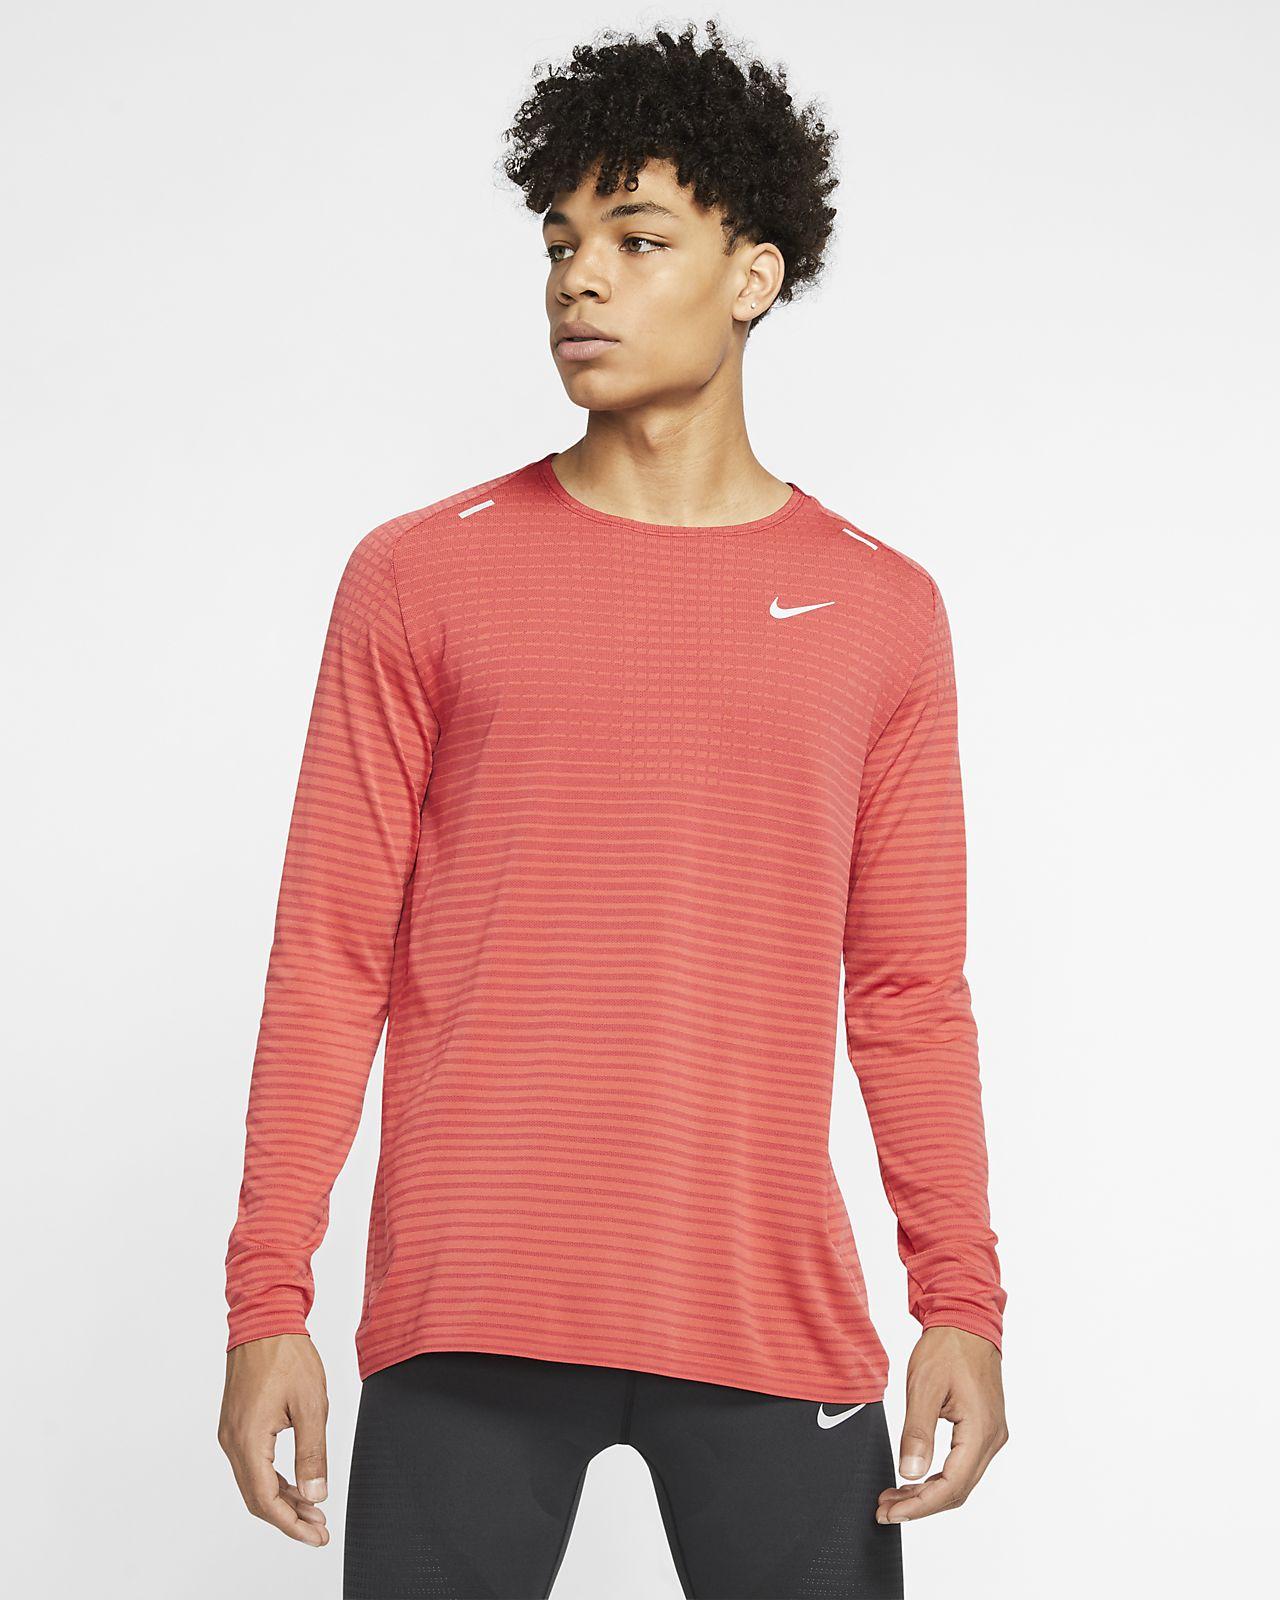 Nike TechKnit Ultra Men's Long-Sleeve Running Top